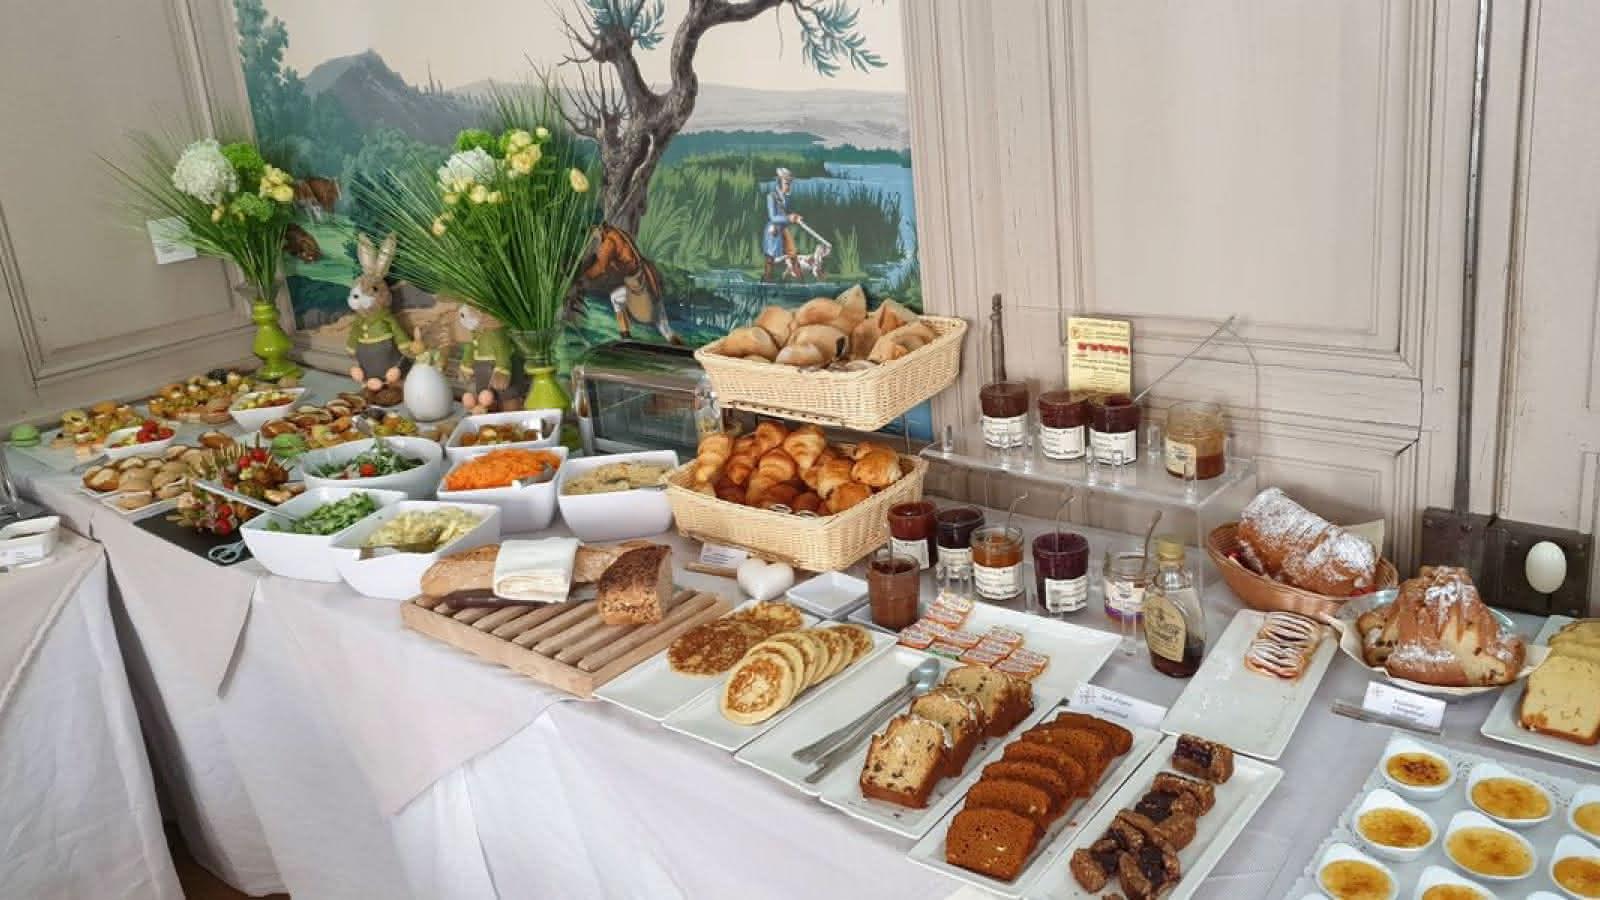 Astounding Hotel Le Bouclier Dor Visit Alsace Download Free Architecture Designs Scobabritishbridgeorg